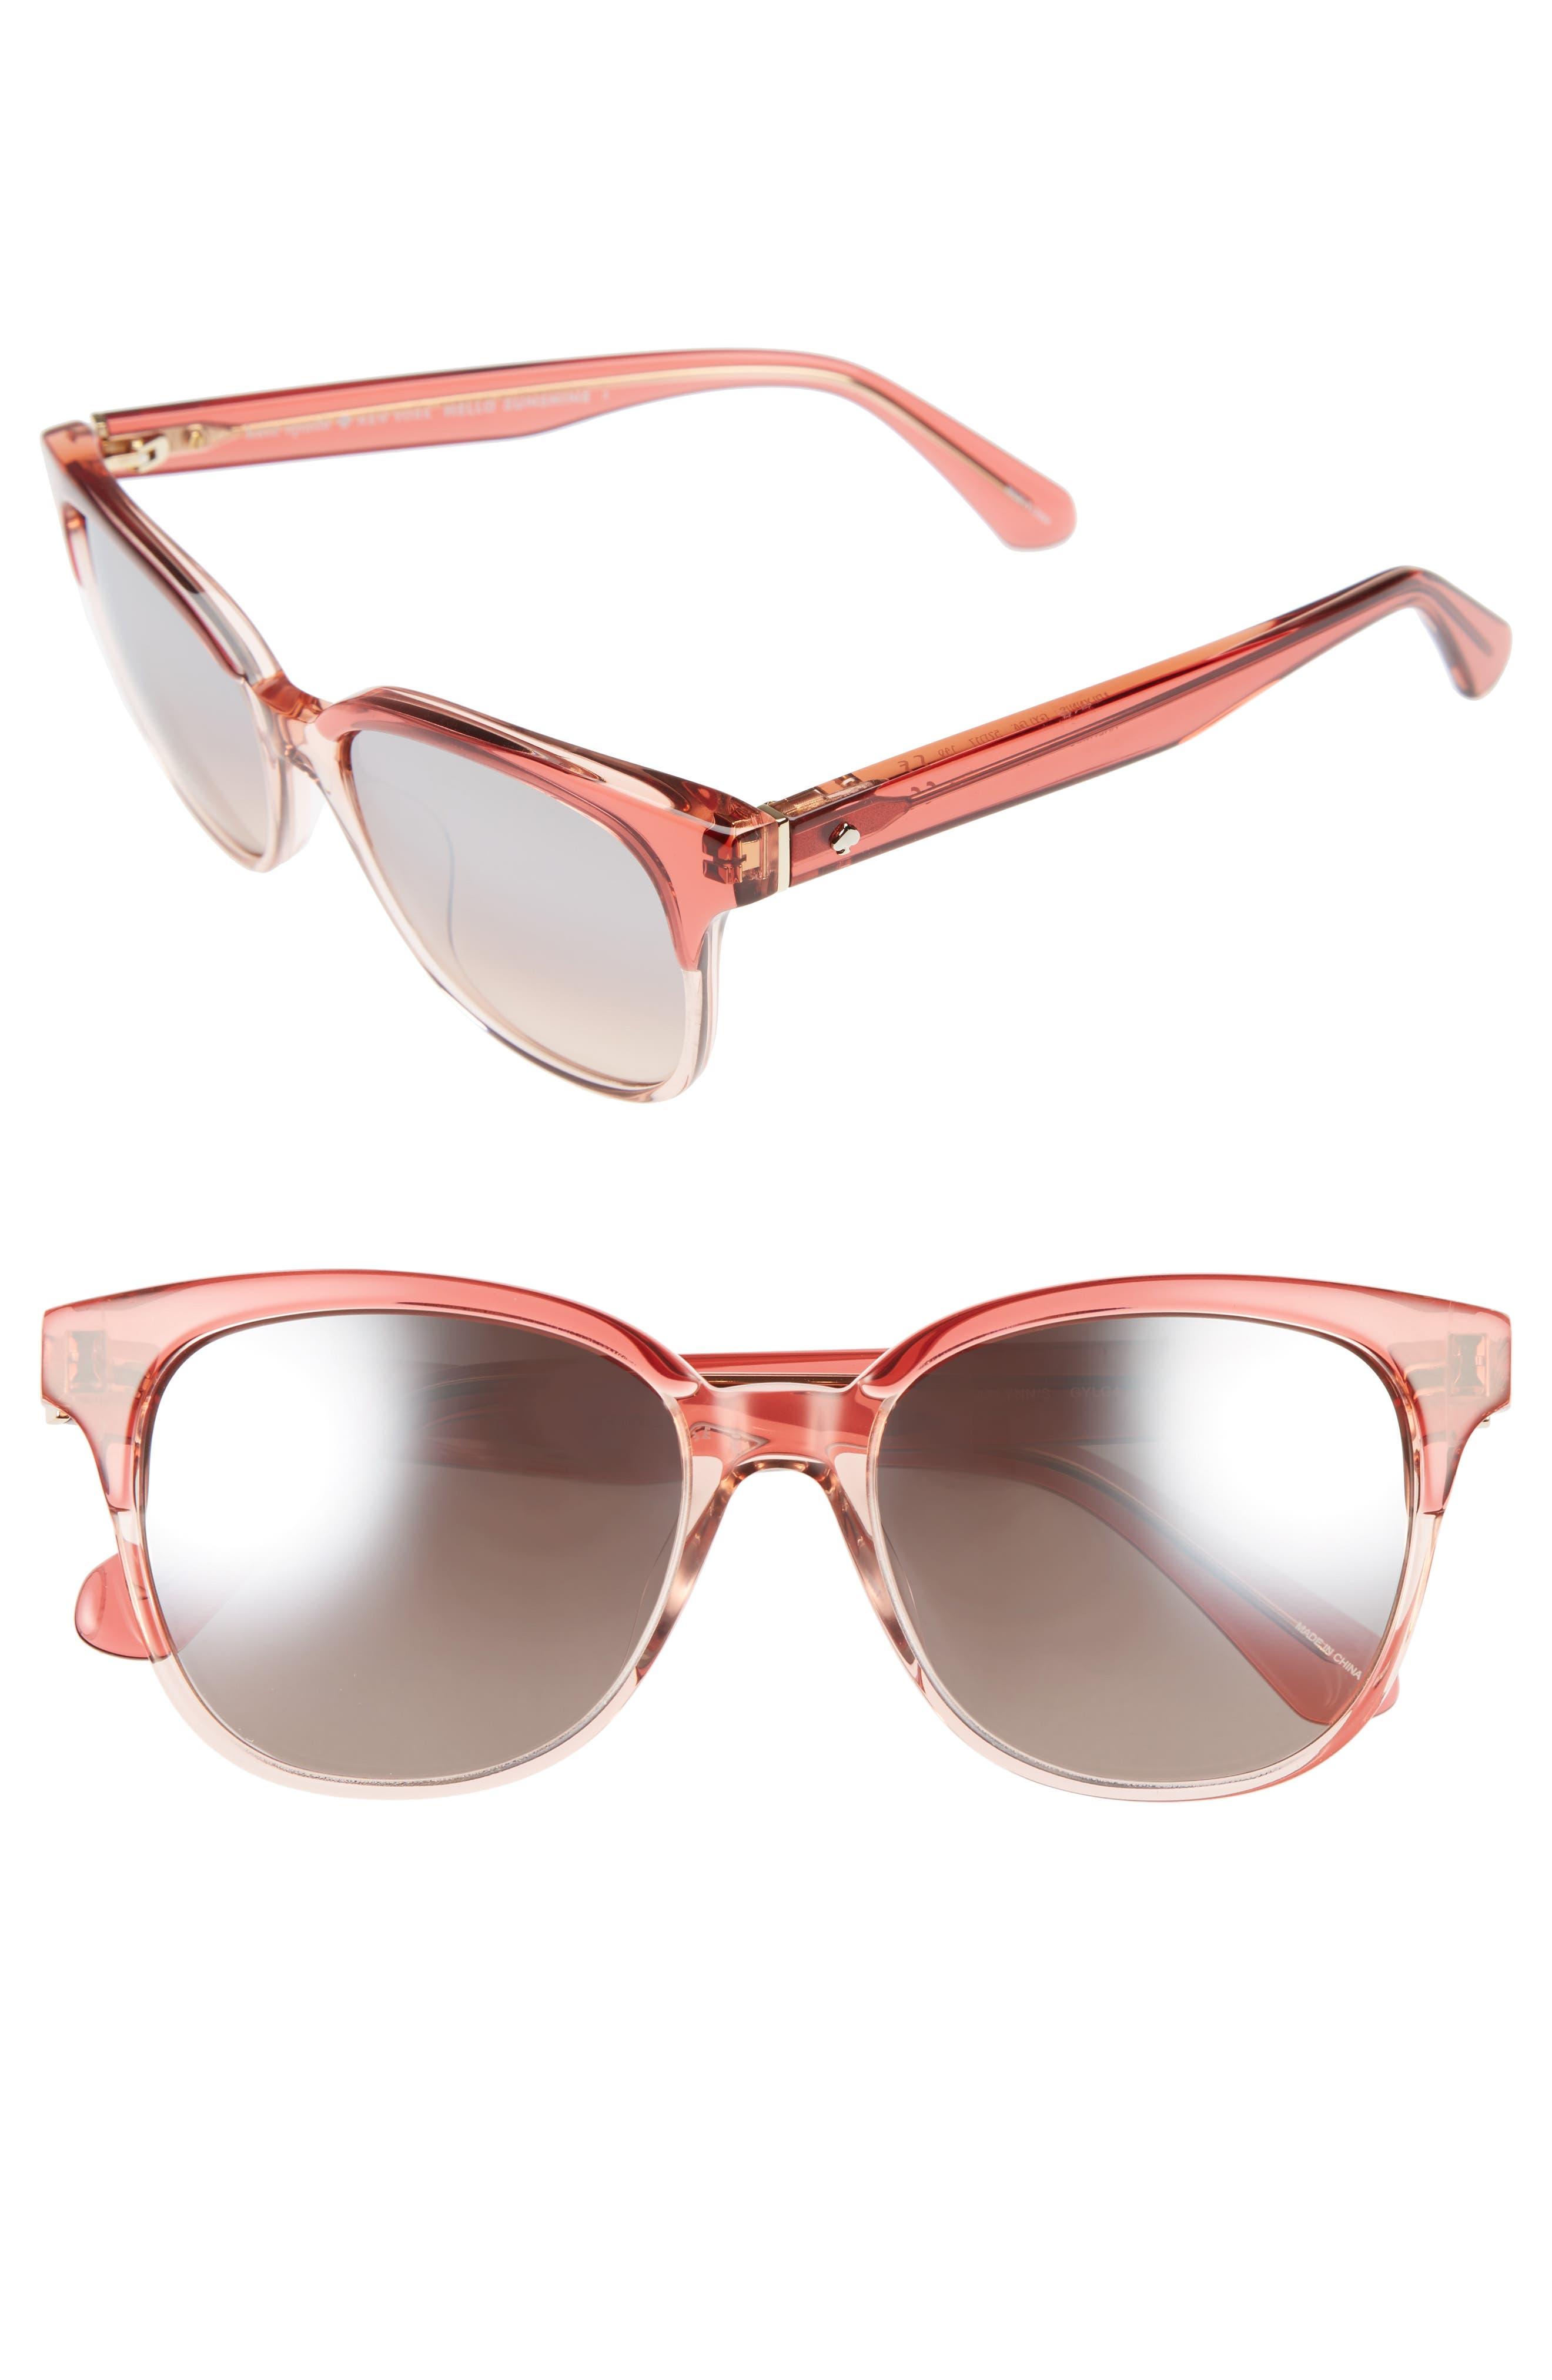 kate spade new york arlynn 52mm Sunglasses